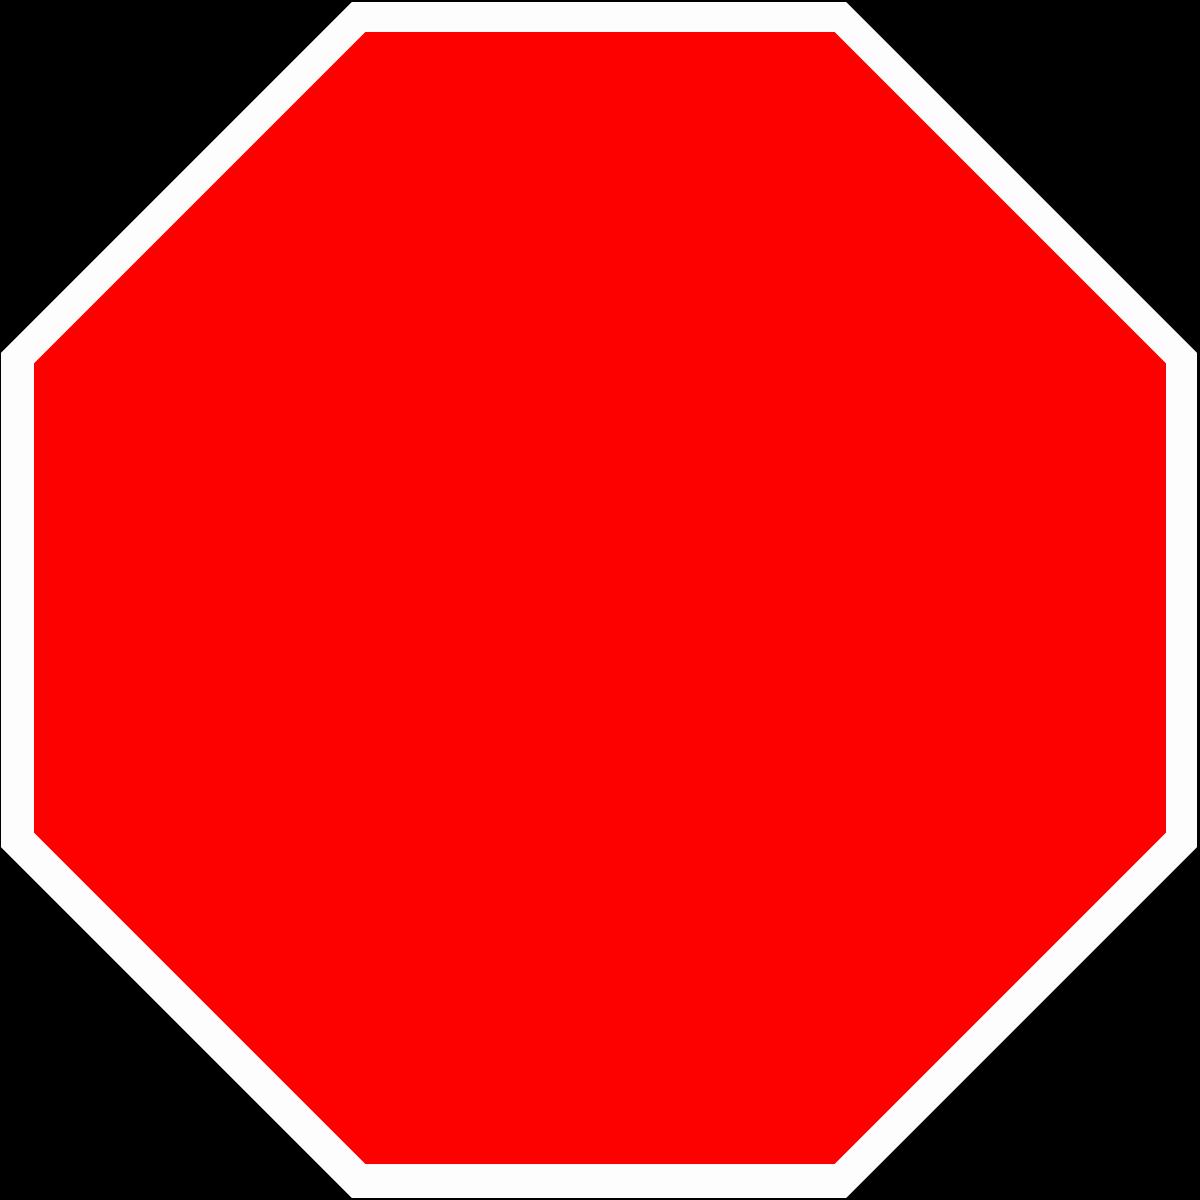 Stop Sign Template Microsoft Word Unique Symbol